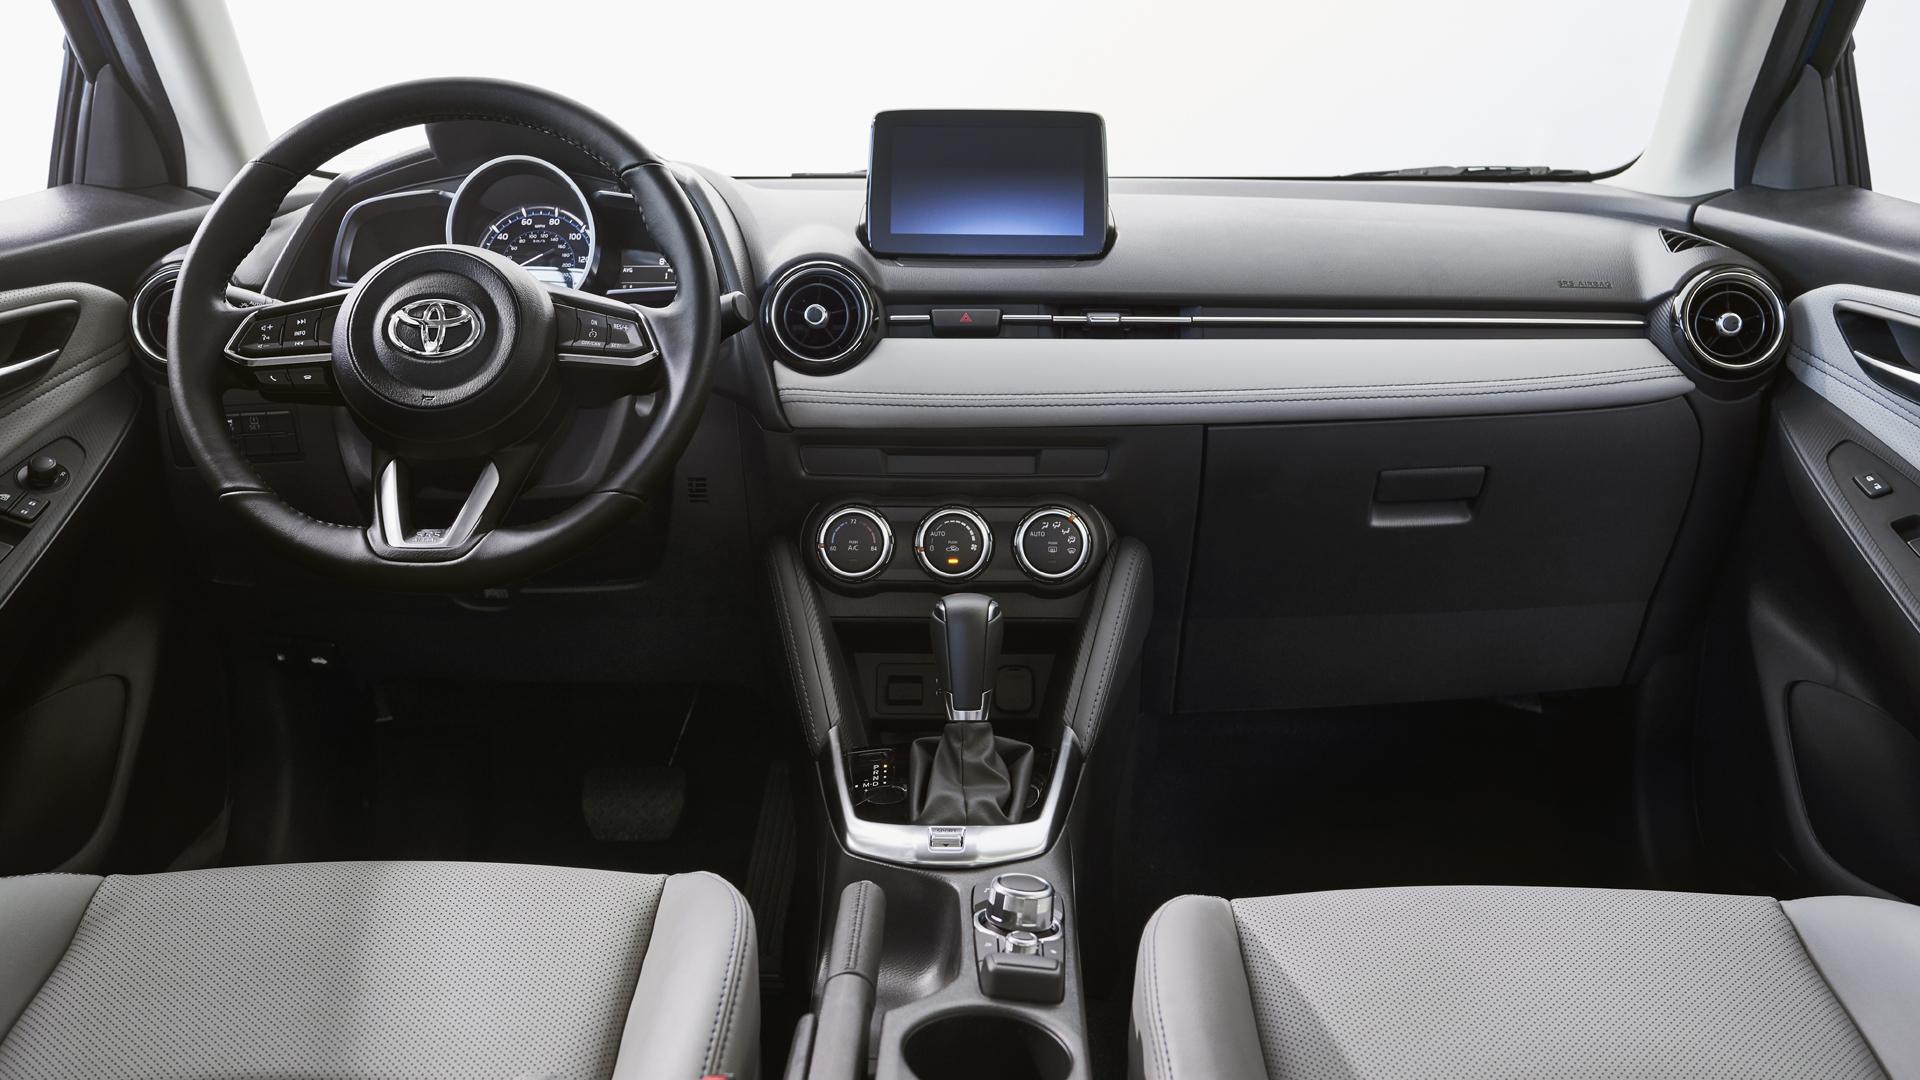 2020-toyota-yaris-hatchback-ic-gorunus